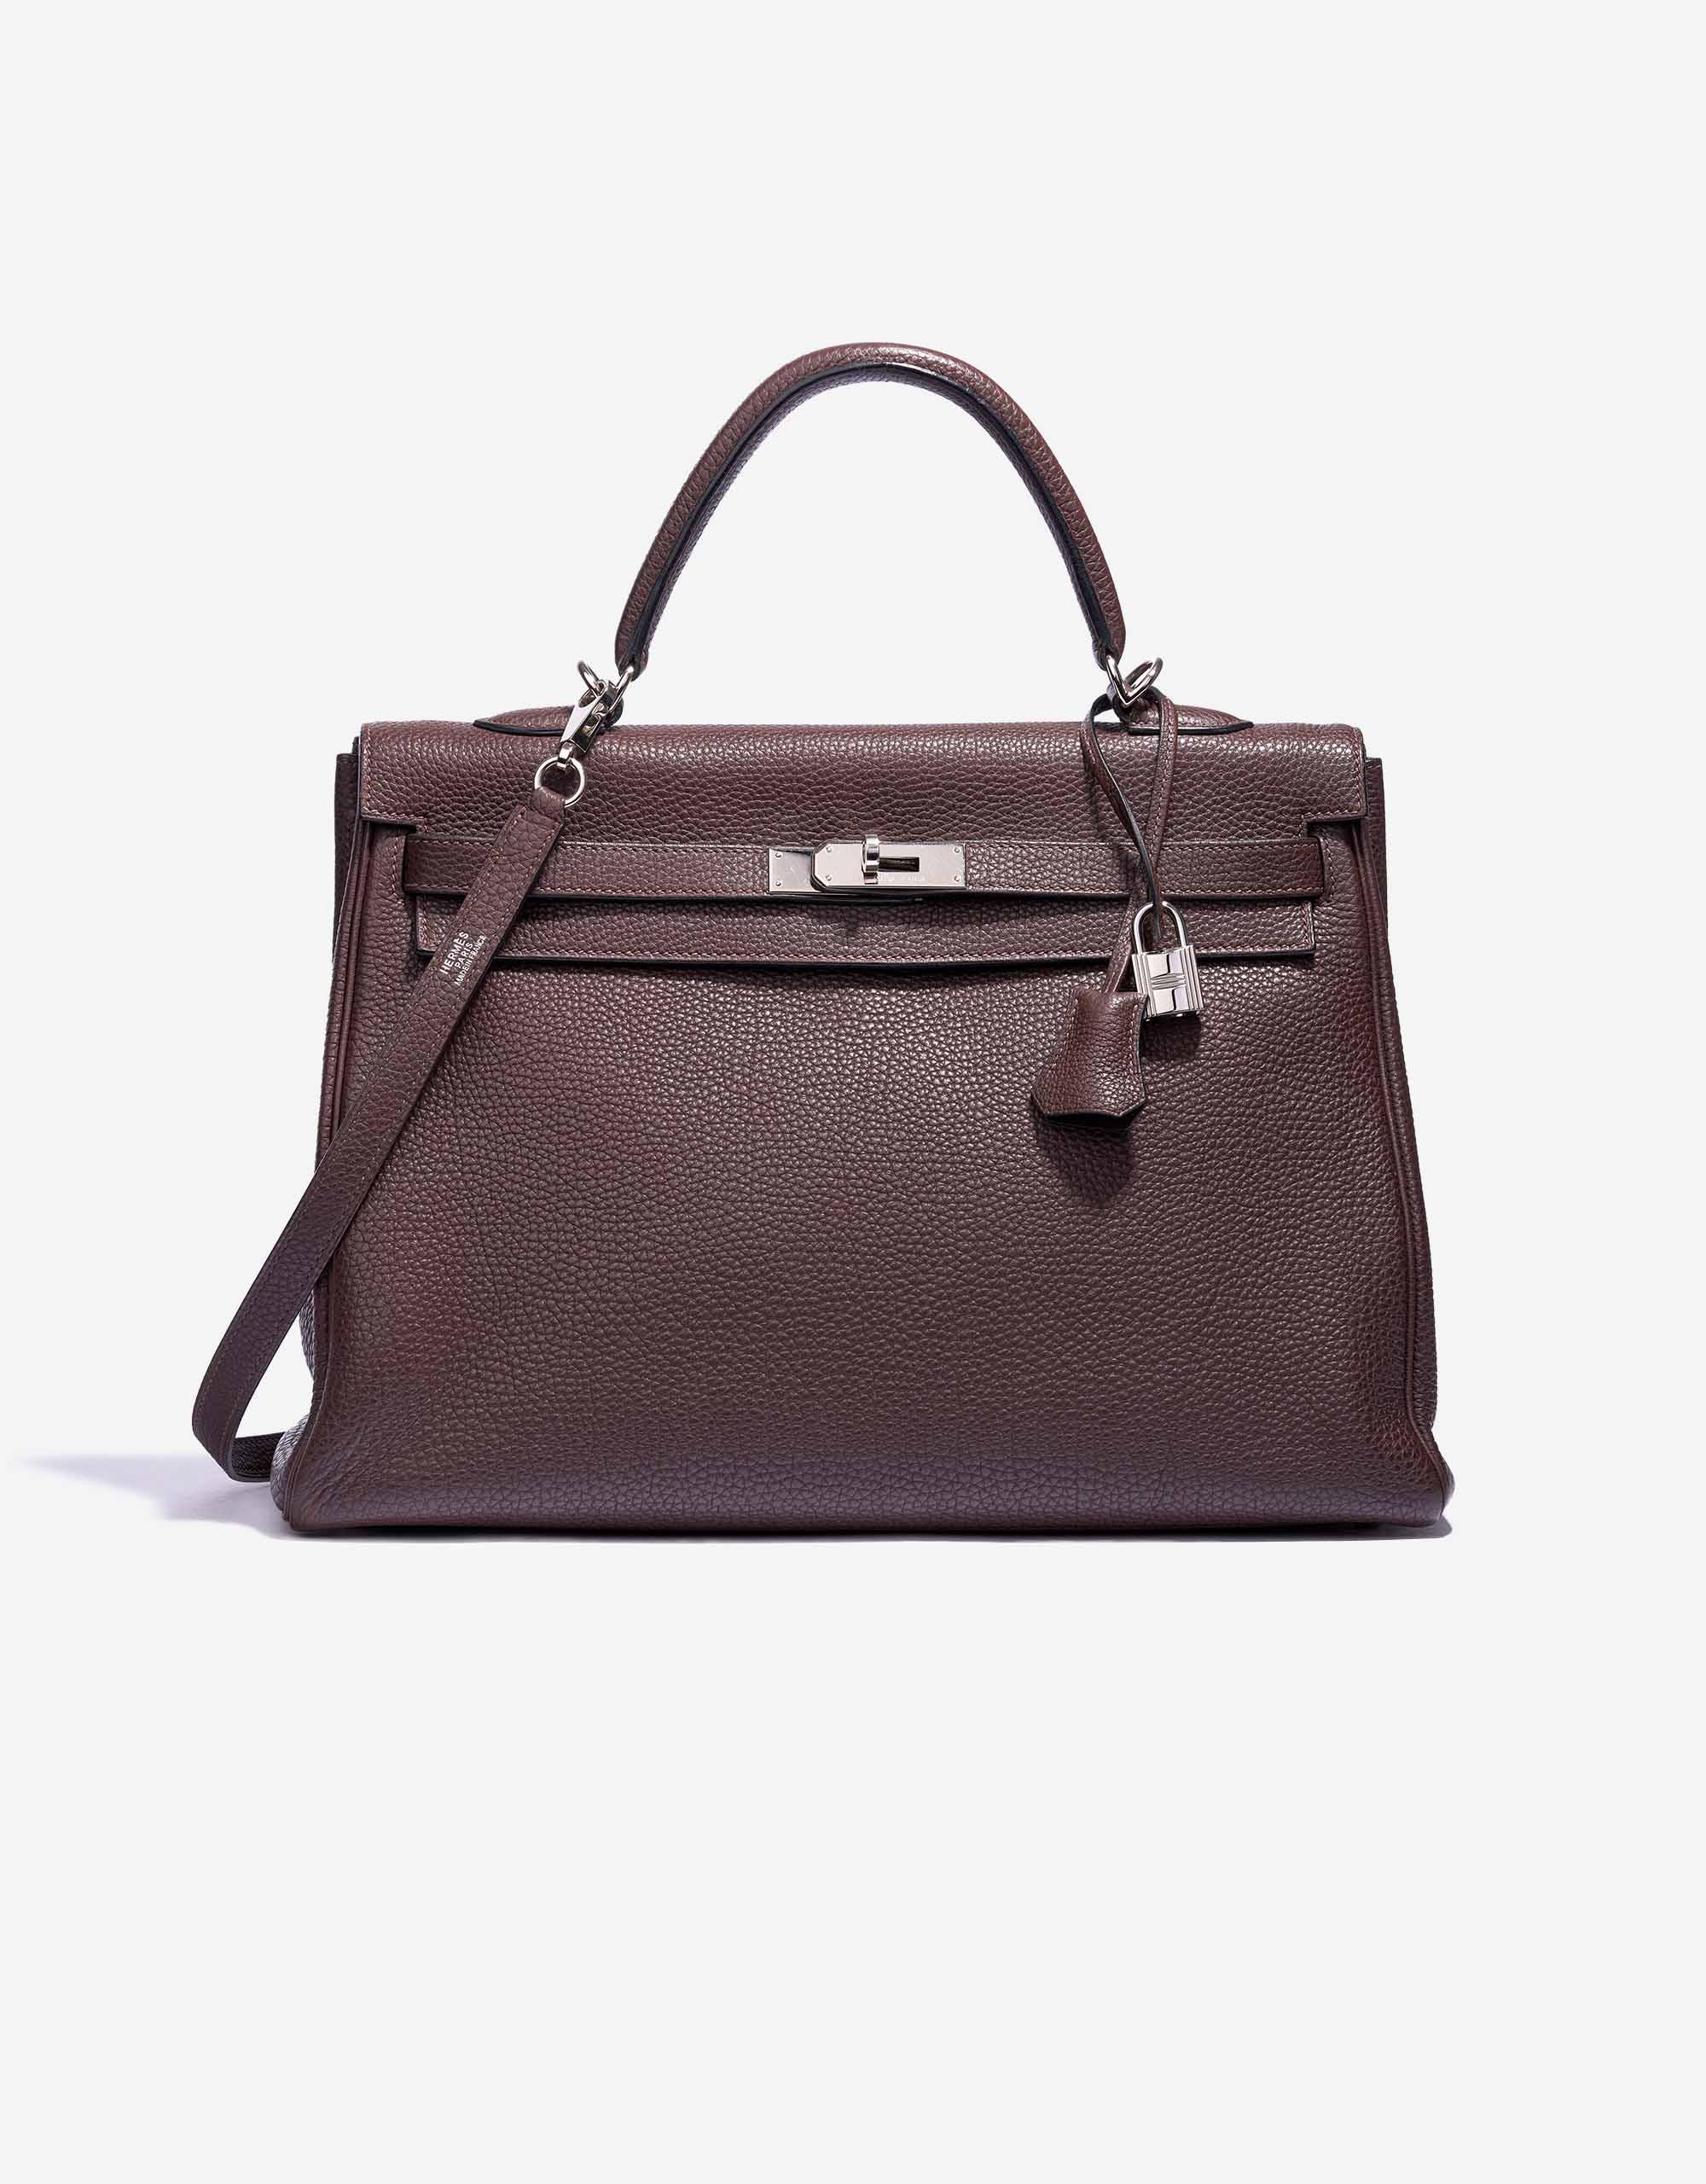 Hermès Kelly 35 Clemence Leather Chocolate | SACLÀB